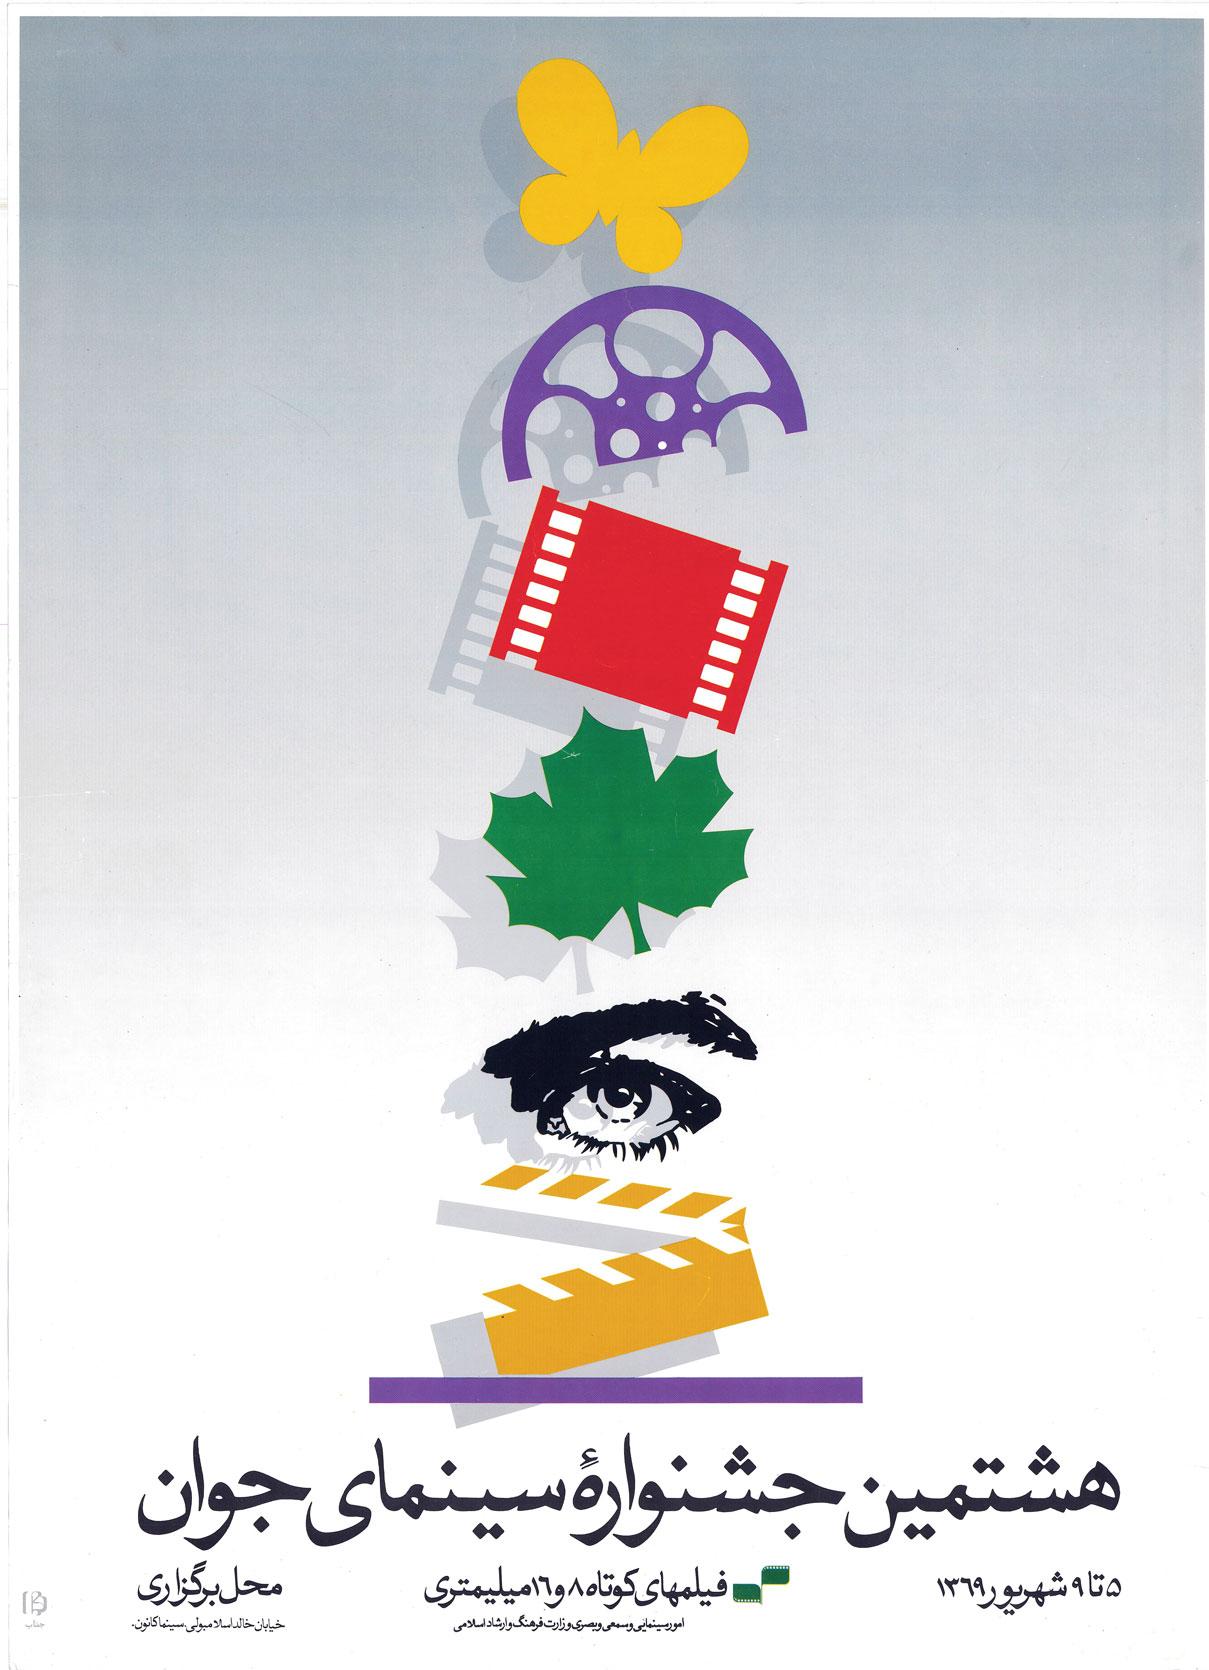 8th Festival 1990